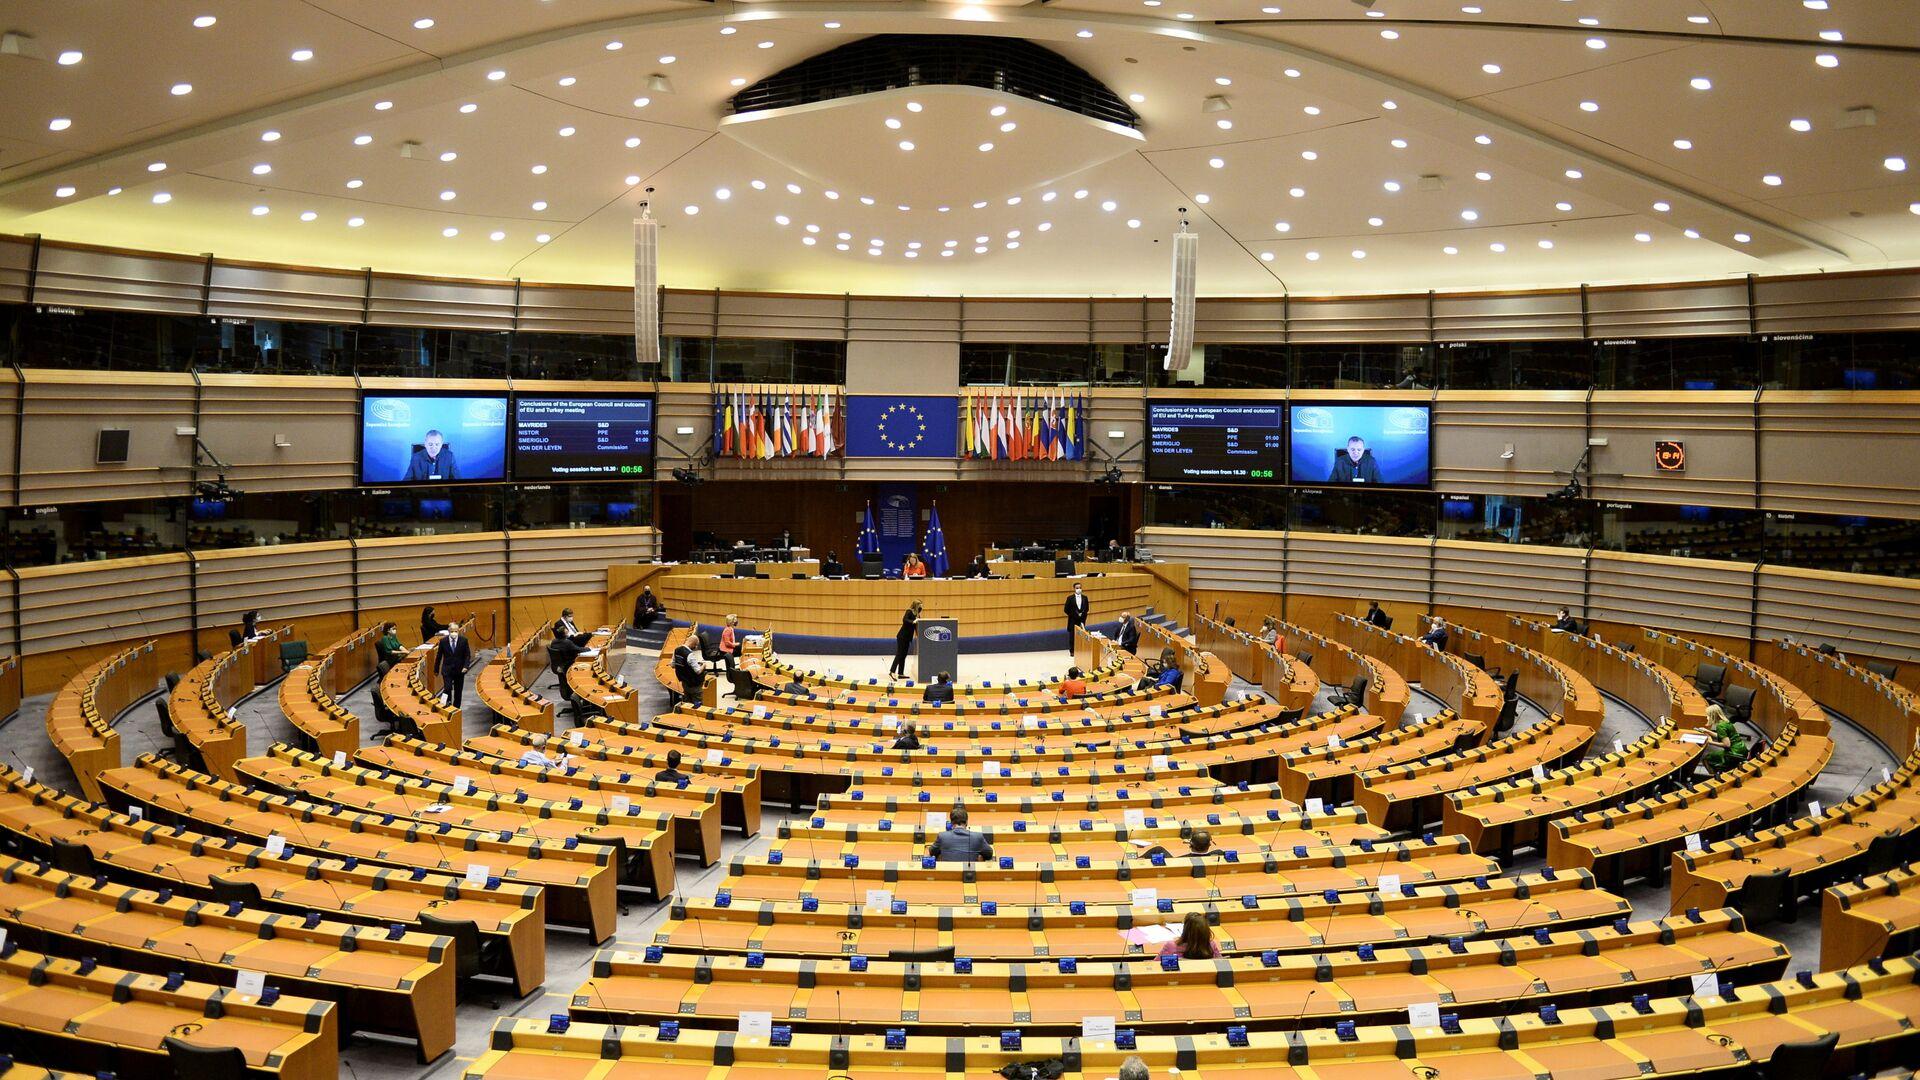 European Council President Charles Michel and European Commission President Ursula von der Leyen attend the EU Parliament plenary session in Brussels, Belgium April 26, 2021 - Sputnik International, 1920, 16.09.2021